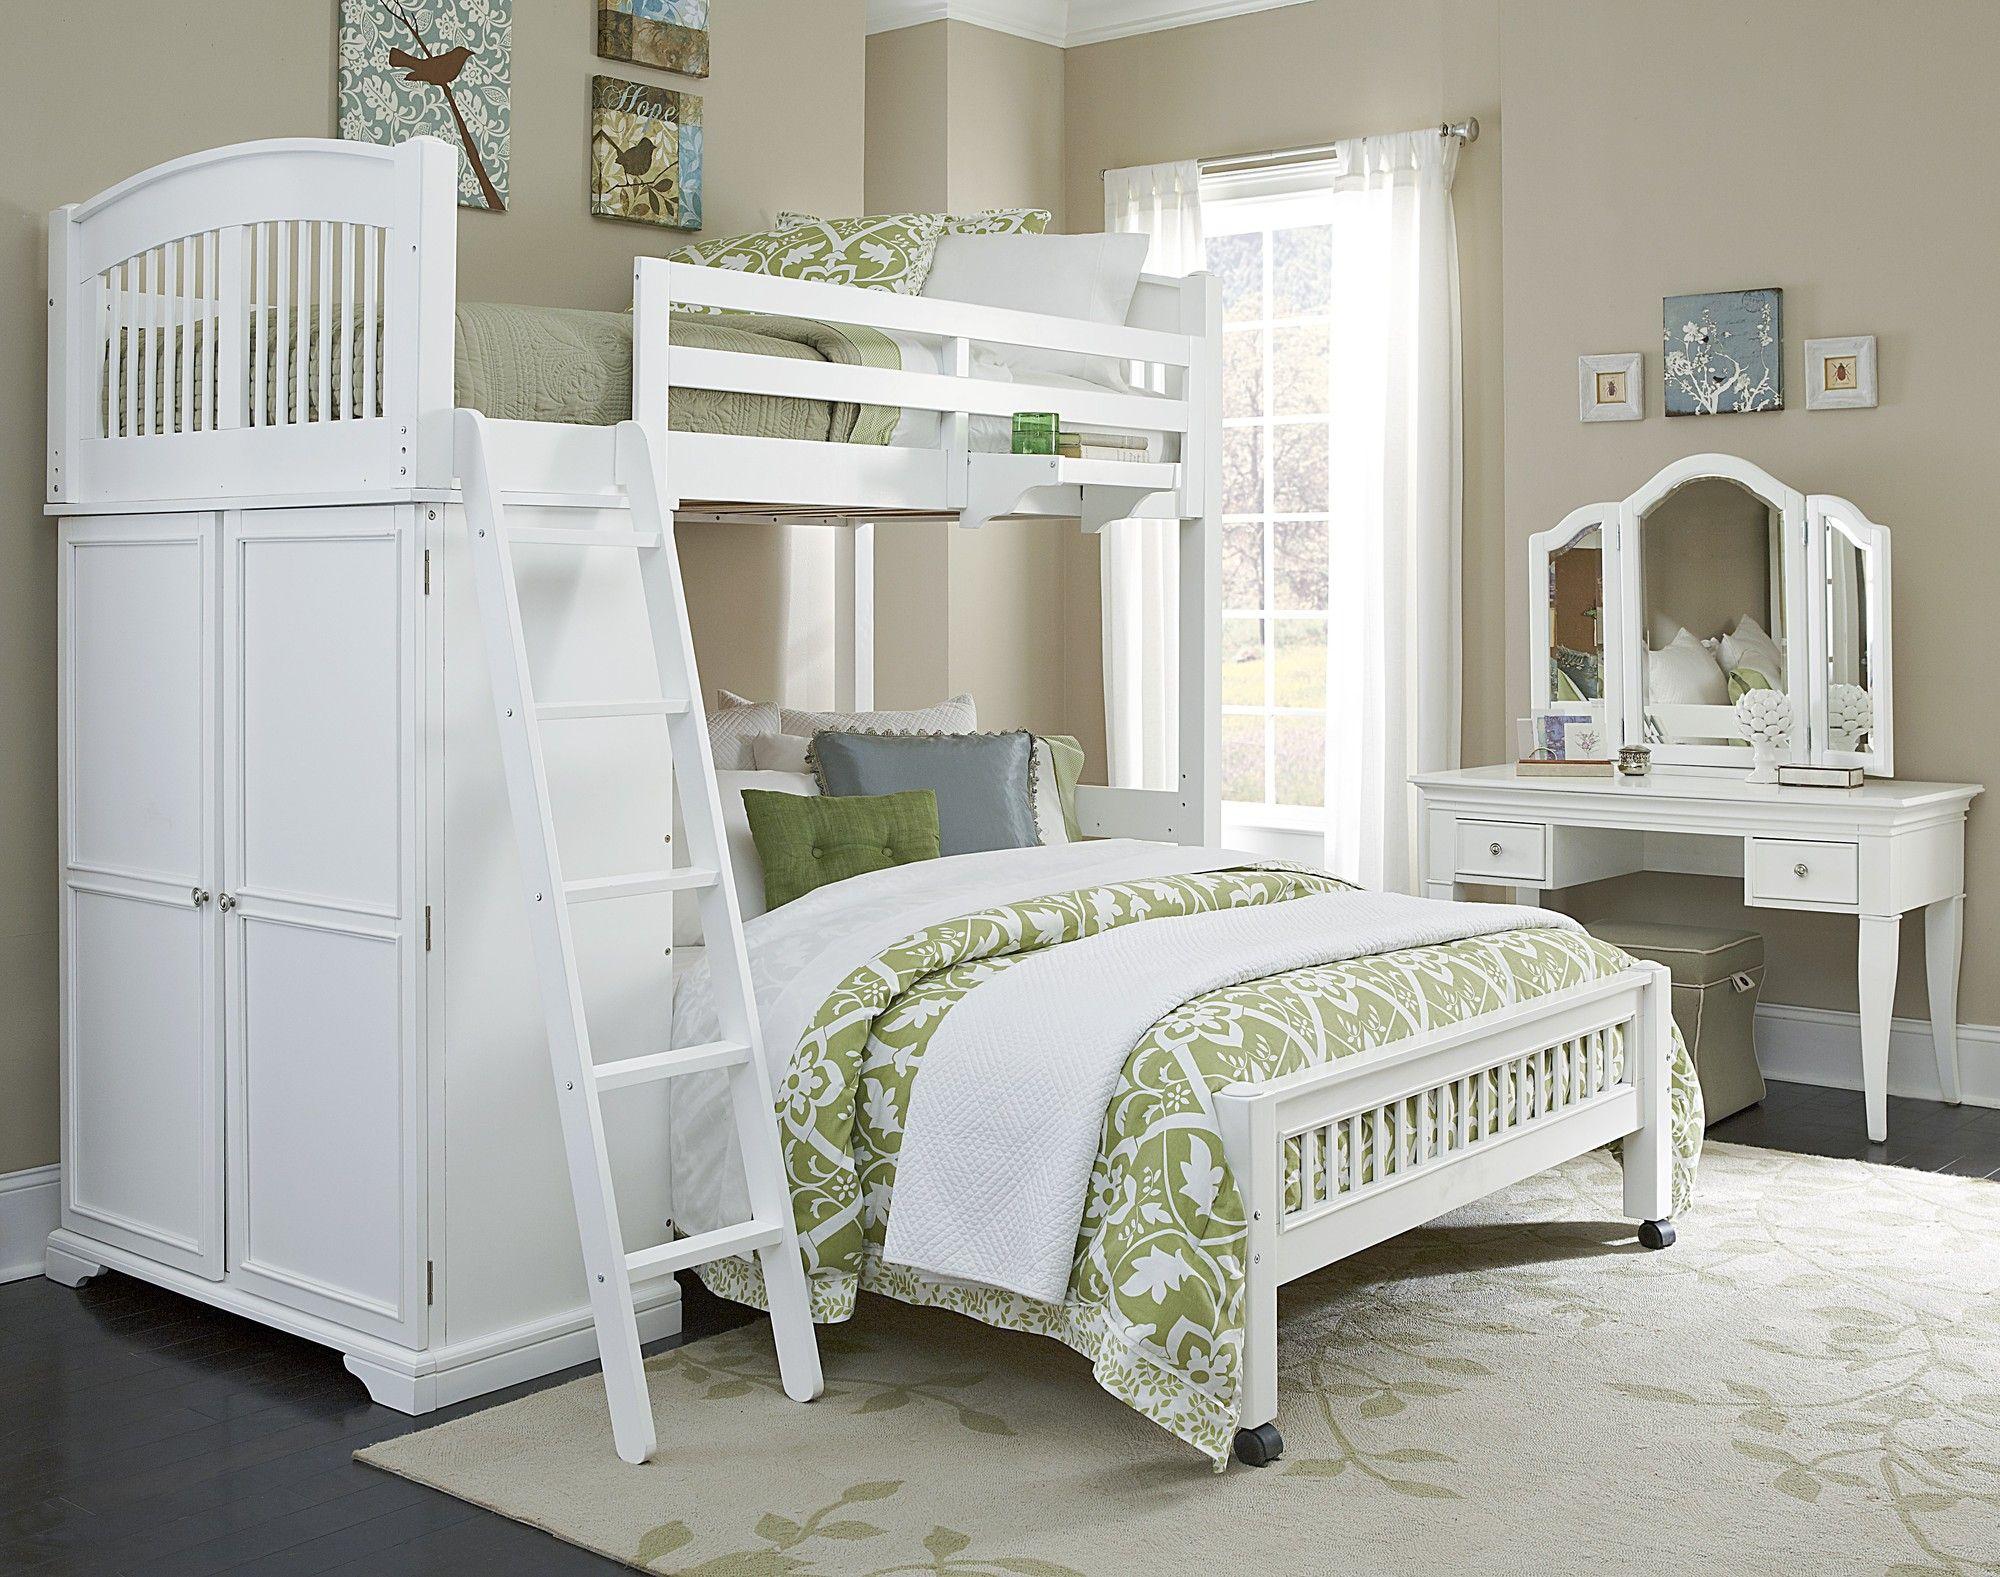 4 bedroom loft  Walnut Street Loft Bedroom Collection  Wayfair  For the Home